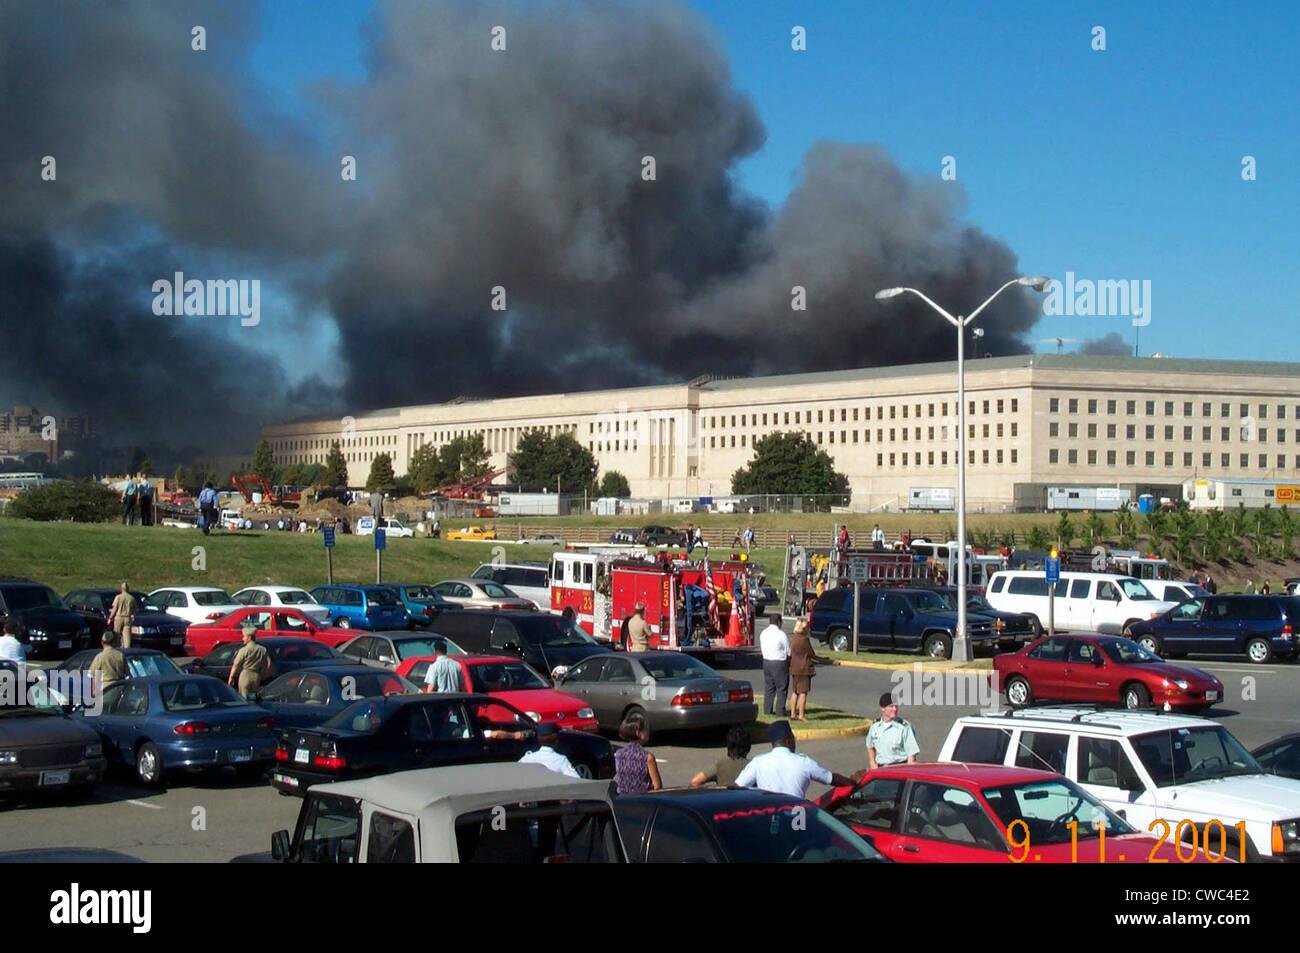 Washington pentagon building stock photos washington for Build on your lot washington state